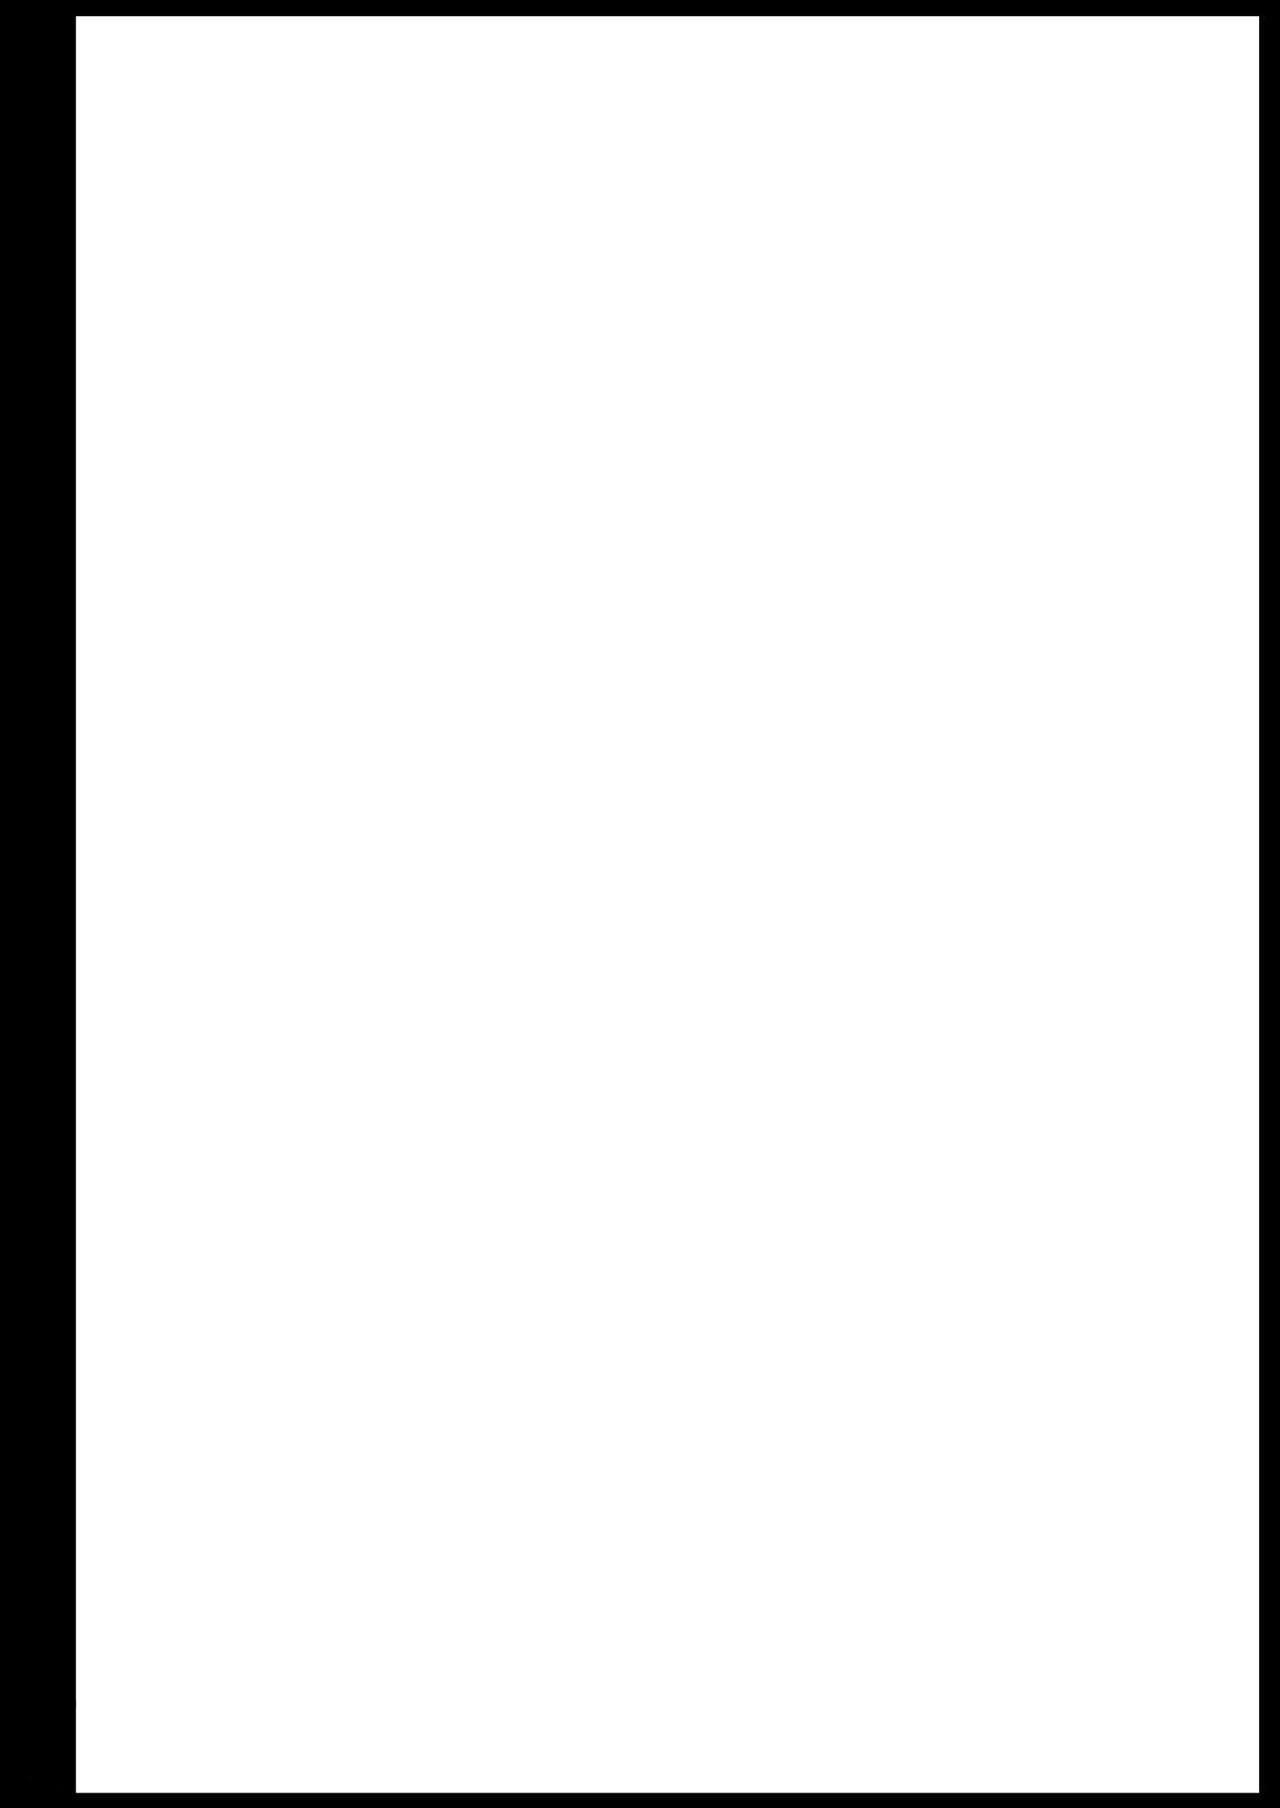 [Eromazun (Ma-kurou)] Kanao Muhyoujou Kan - RAPE OF DEMON SLAYER 3 | Rape of the Emotionless Kanao - Rape of Demon Slayer 3 (Kimetsu no Yaiba) [English] [Keye Necktire] [Digital] 1